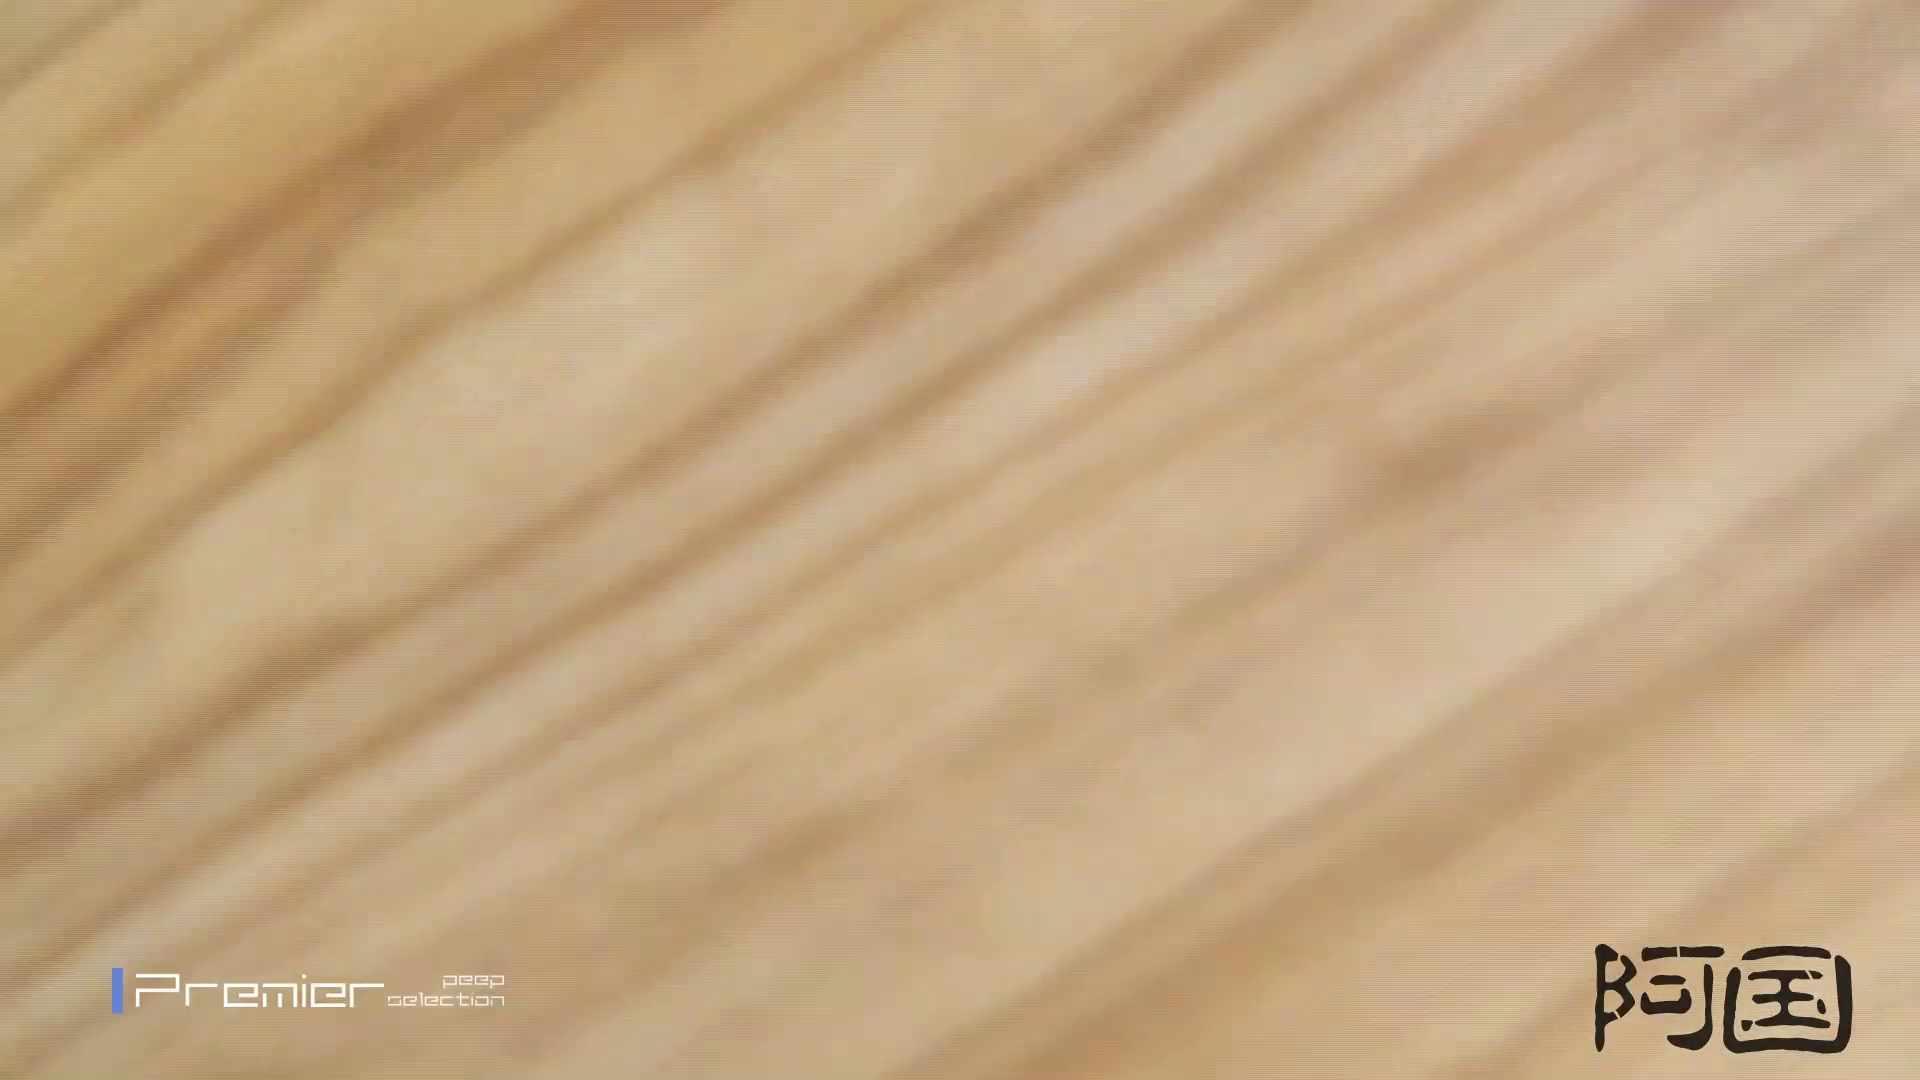 和式洋式七変化 Vol.34 最終作、 シリーズ最高の美人登場 洗面所  91pic 40